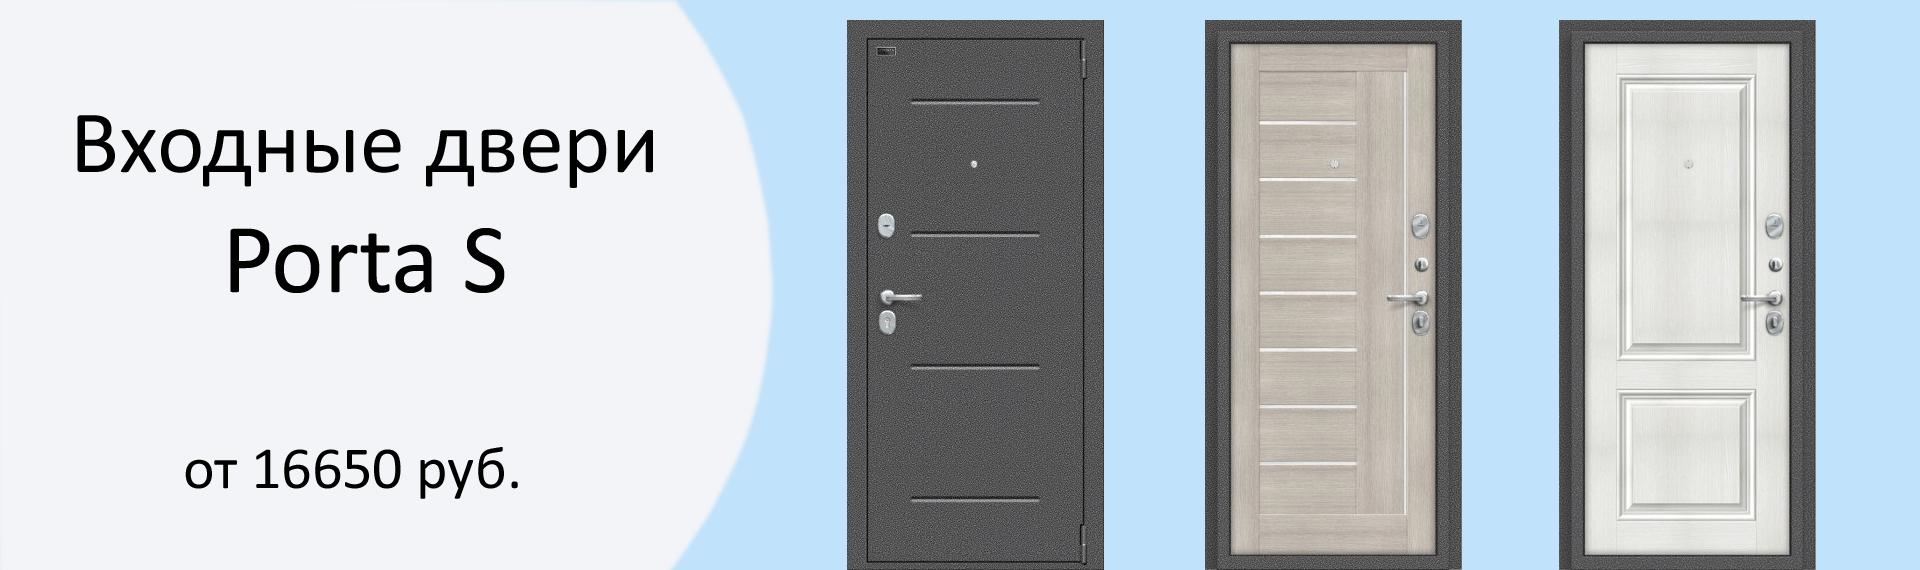 Большой выбор дверной фурнитуры